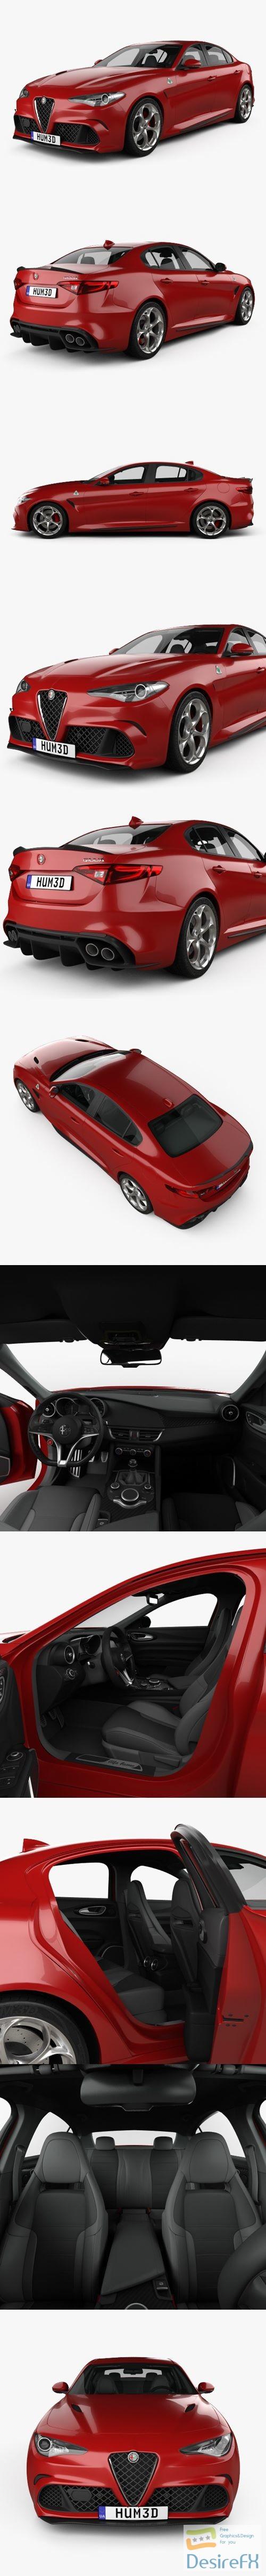 3d-models - Alfa Romeo Giulia Quadrifoglio with HQ interior 2016 3D Model